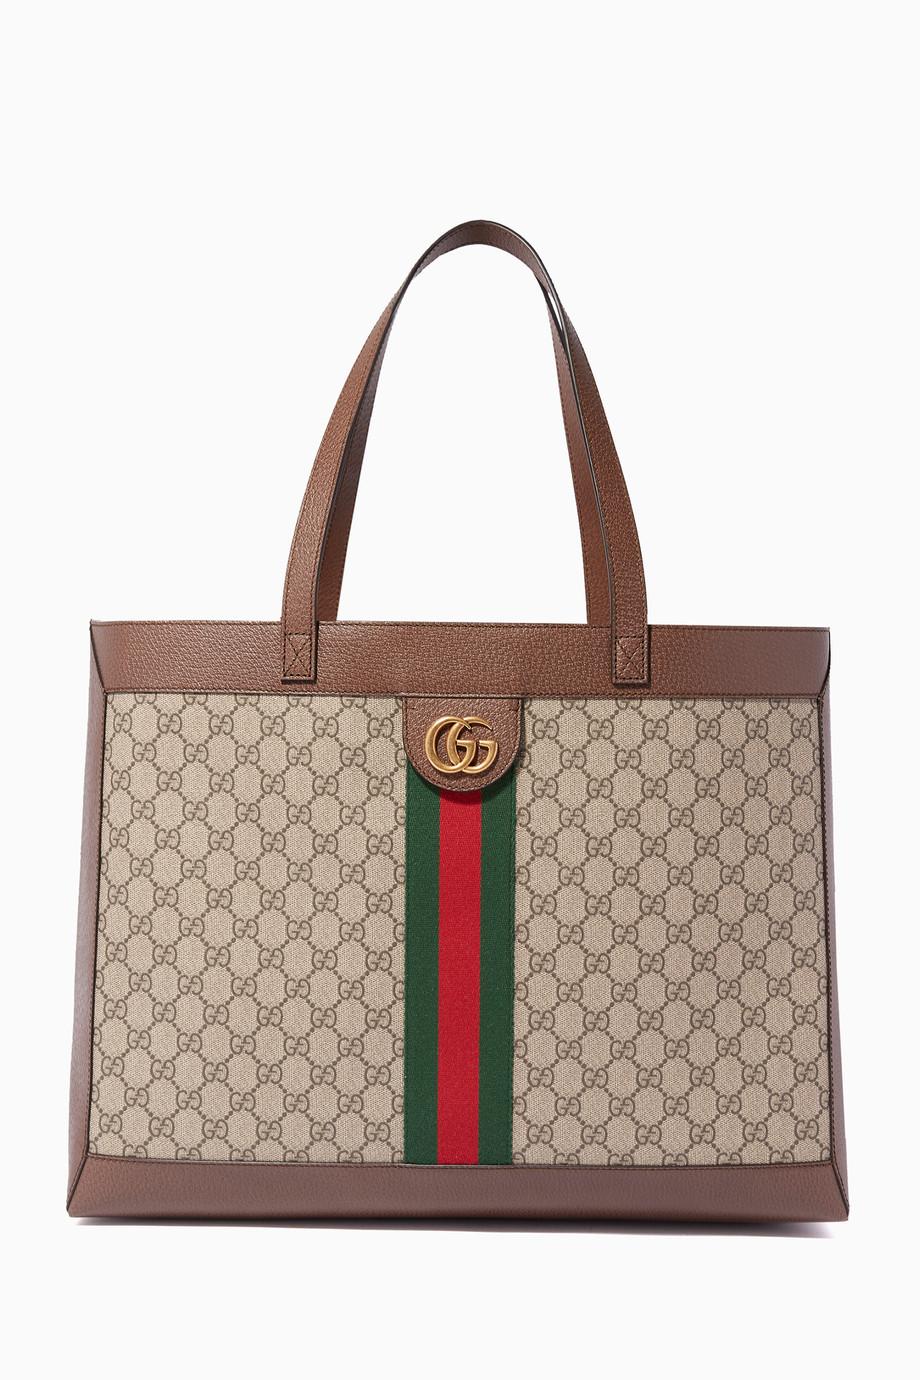 41bb16bf3f44d تسوق حقيبة يد أوفيديا بحرفي GG بيج وبني Gucci لون طبيعى للنساء ...